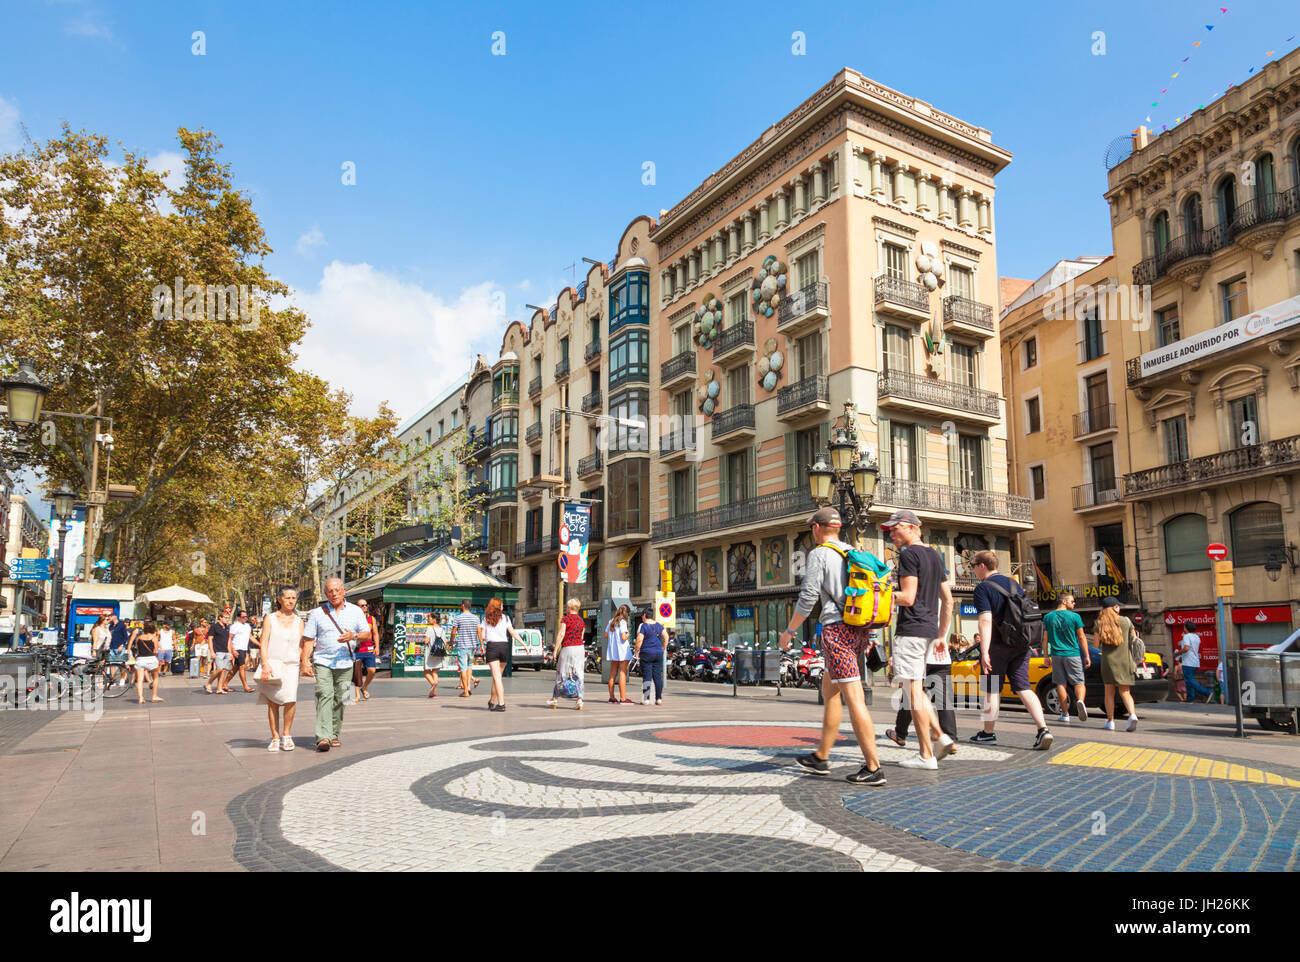 The Barcelona Miro mosaic on La Rambla (Las Ramblas) boulevard, the promenade through Barcelona, Catalonia (Catalunya), - Stock Image